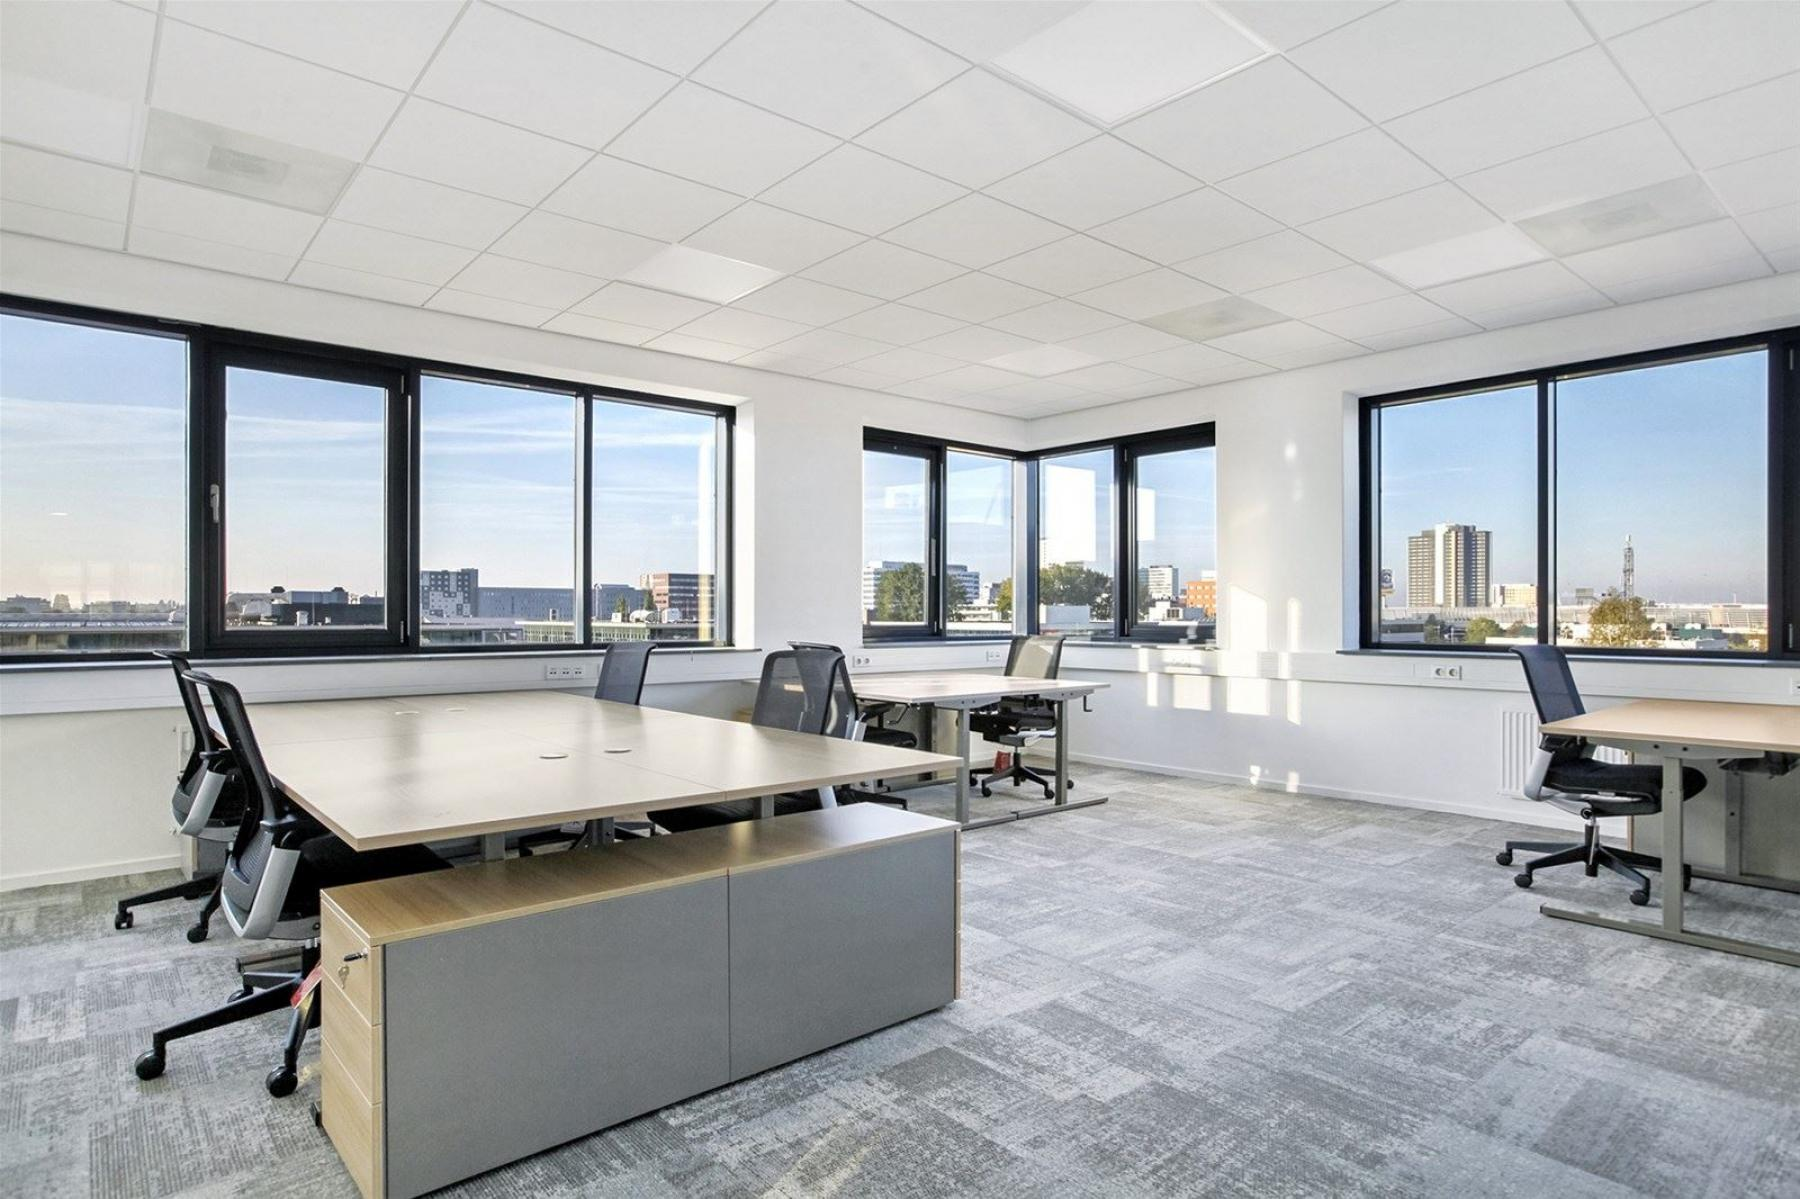 Rent office space Zekeringstraat 34, Amsterdam (5)